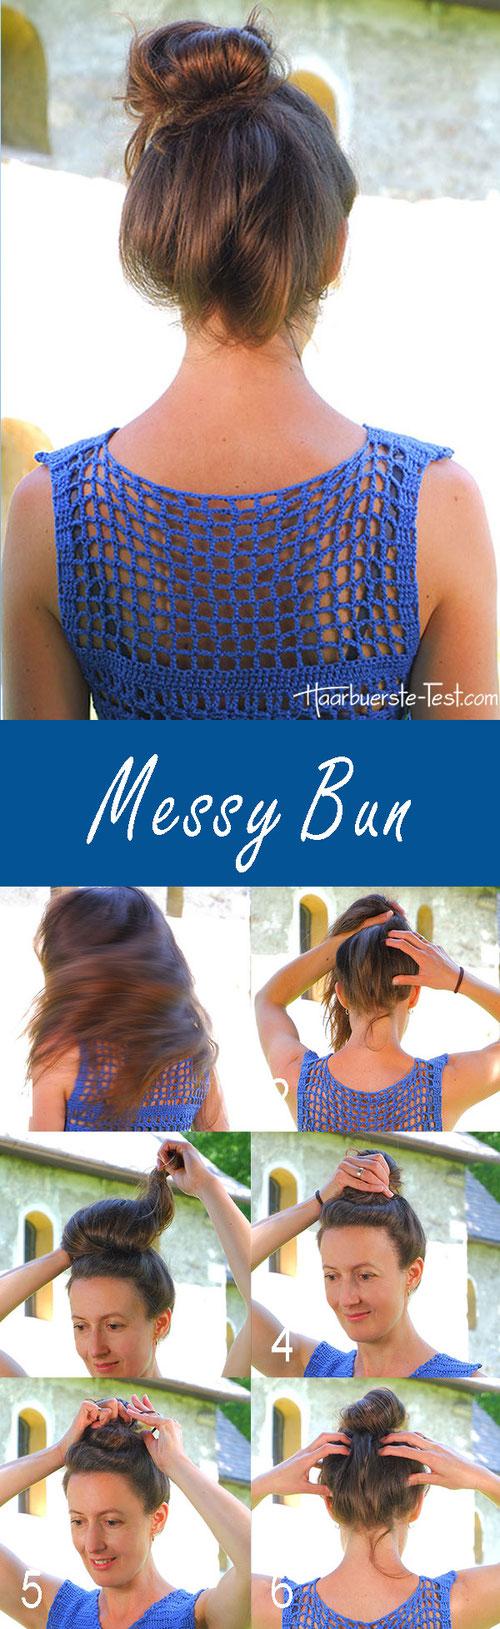 messy bun anleitung deutsch, messy bun anleitung, messy bun anleitung lange Haare